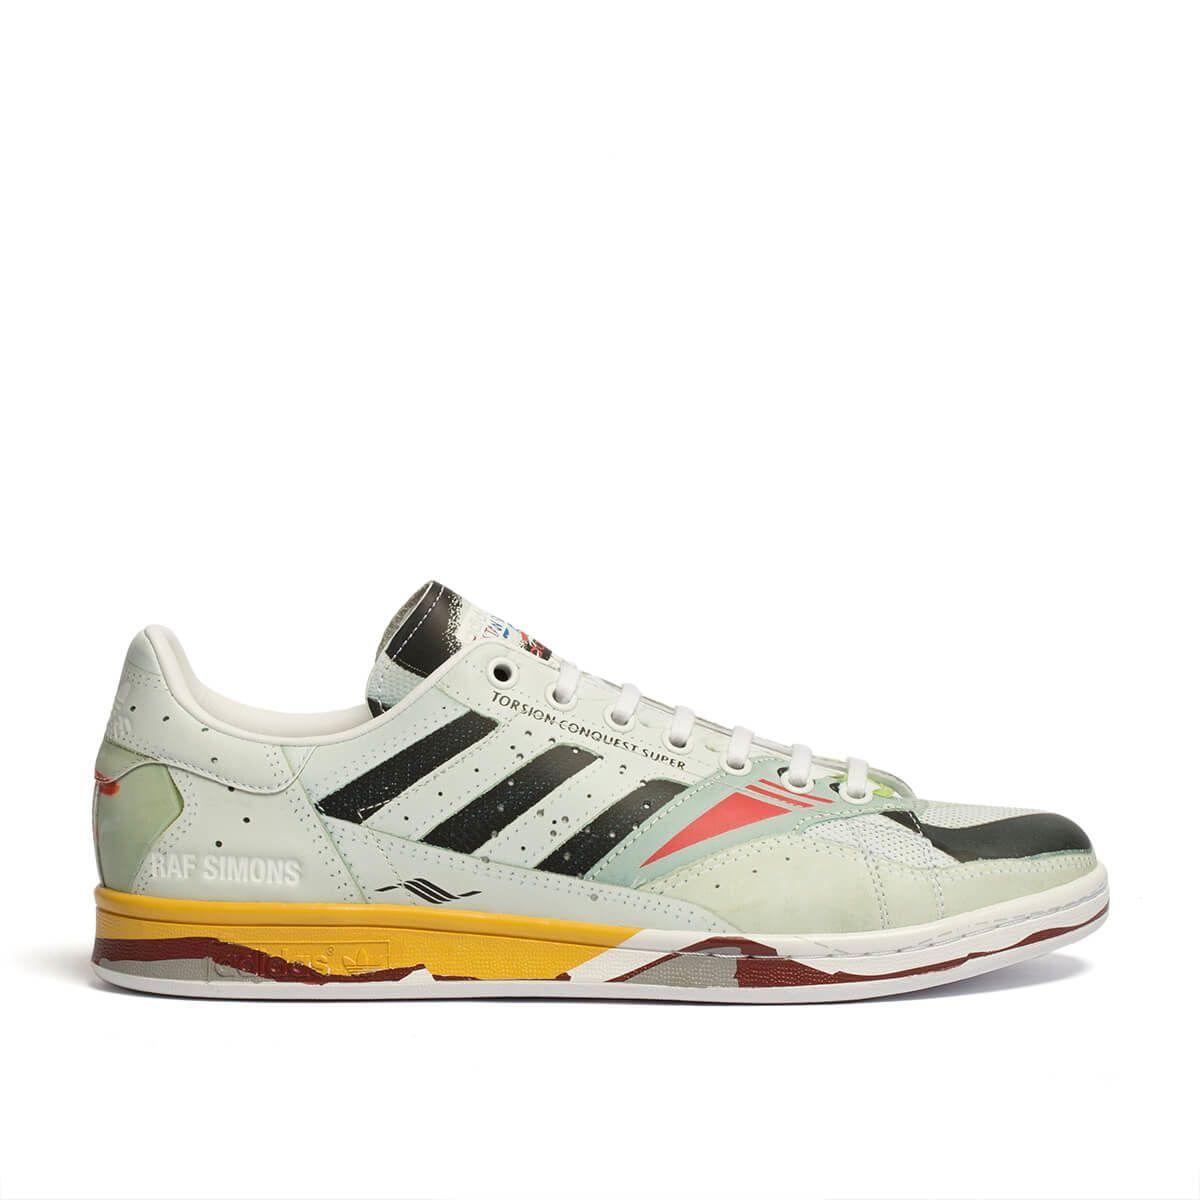 324a32a413b55 ADIDAS BY RAF SIMONS TORSION STAN SNEAKERS.  adidasbyrafsimons  shoes